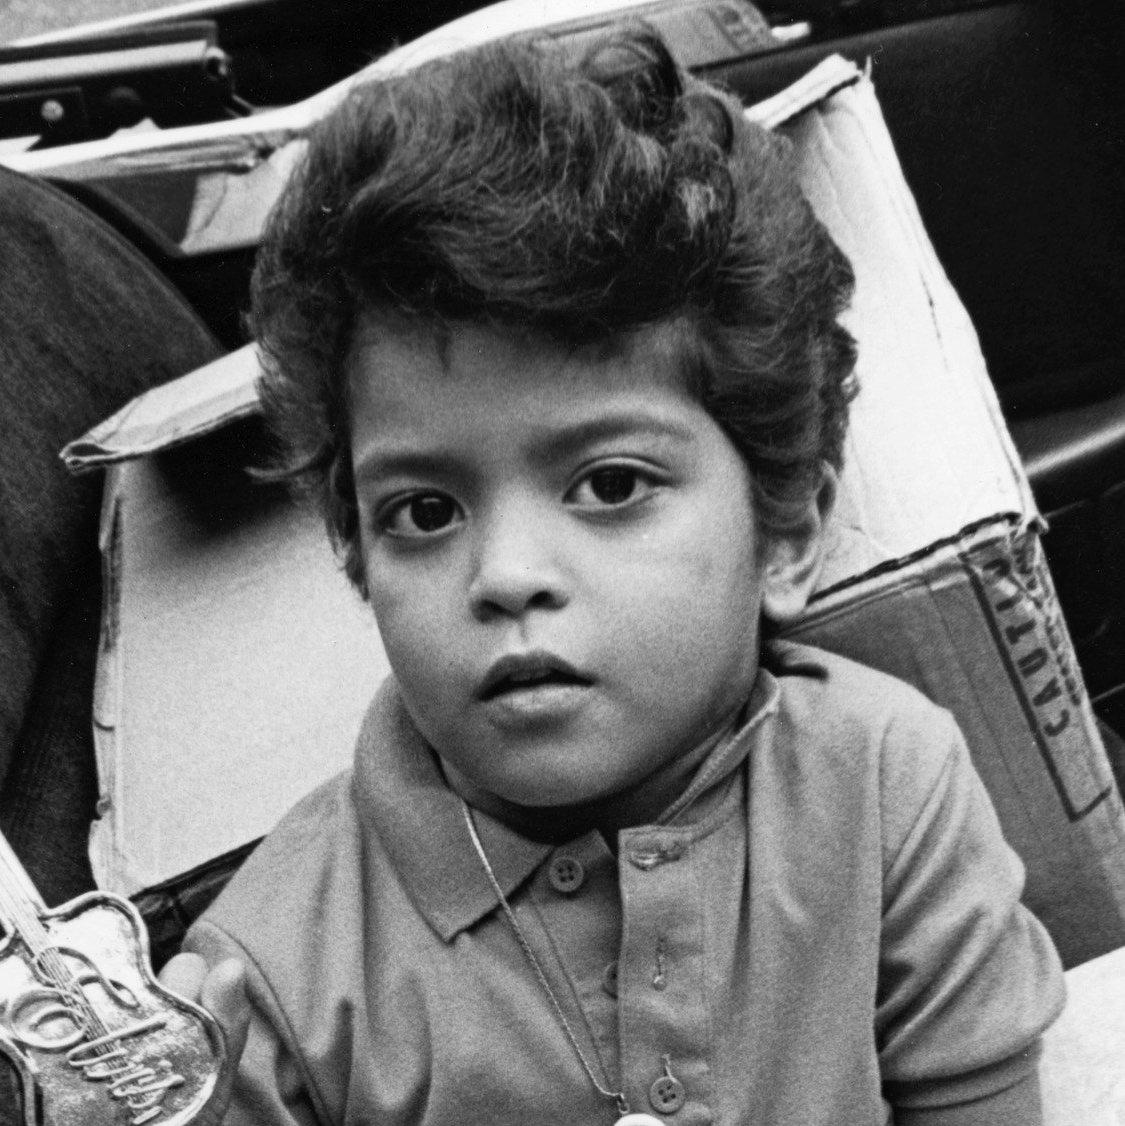 Flint, Bruno Mars, African American Philanthropy, African American News, KOLUMN Magazine, KOLUMN